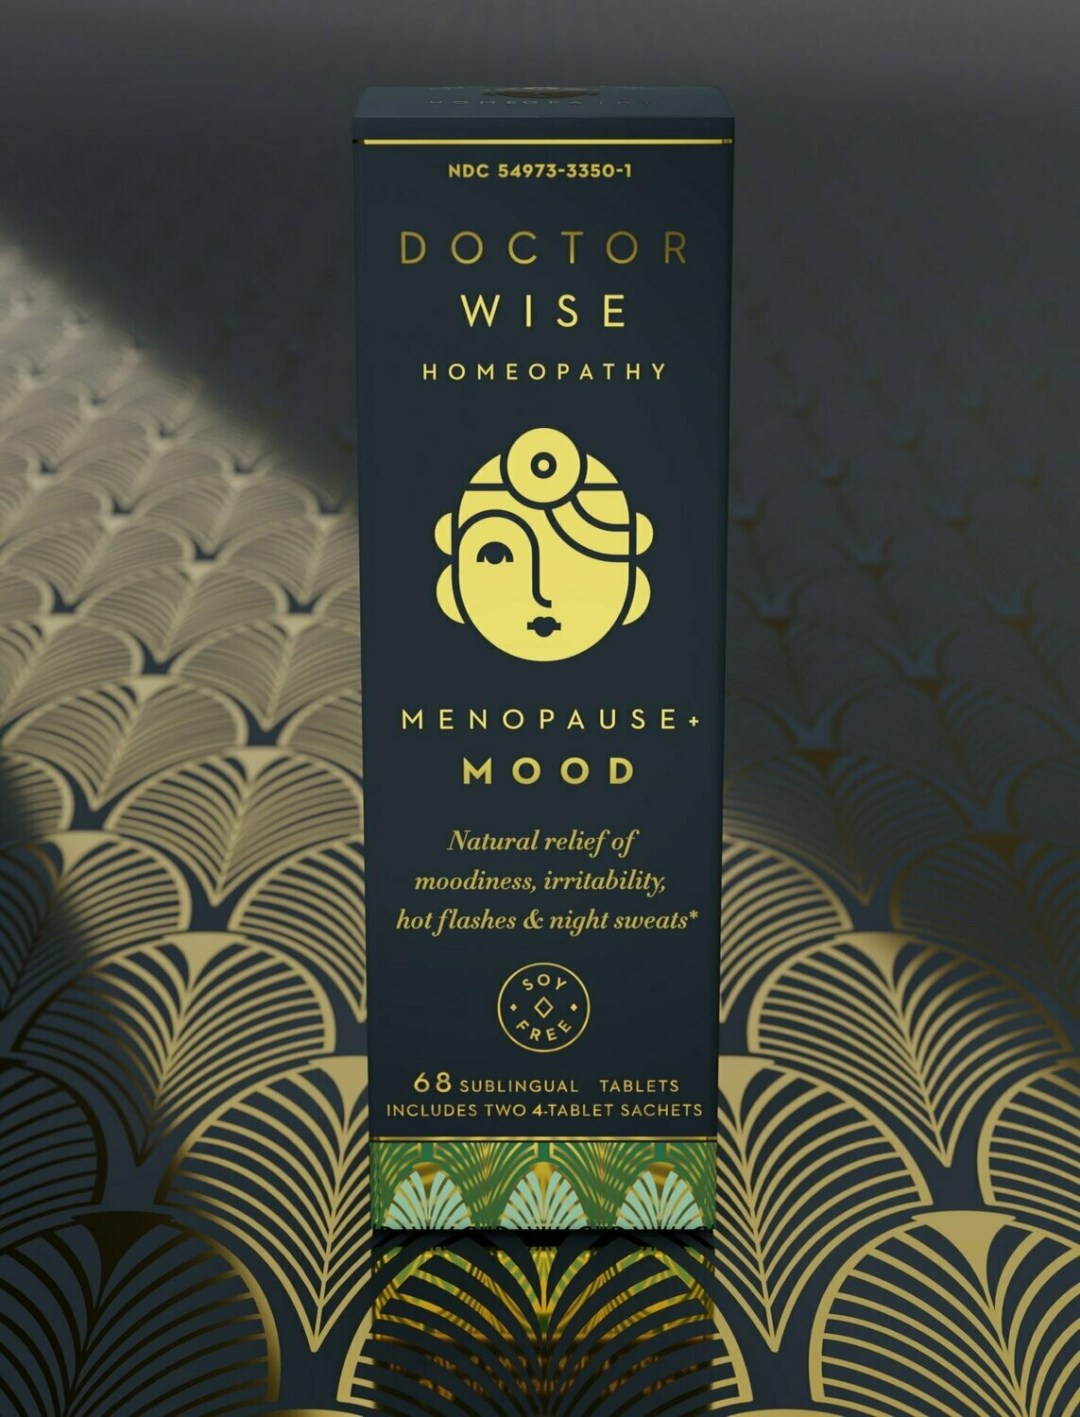 Doctor Wise Menopause Mood